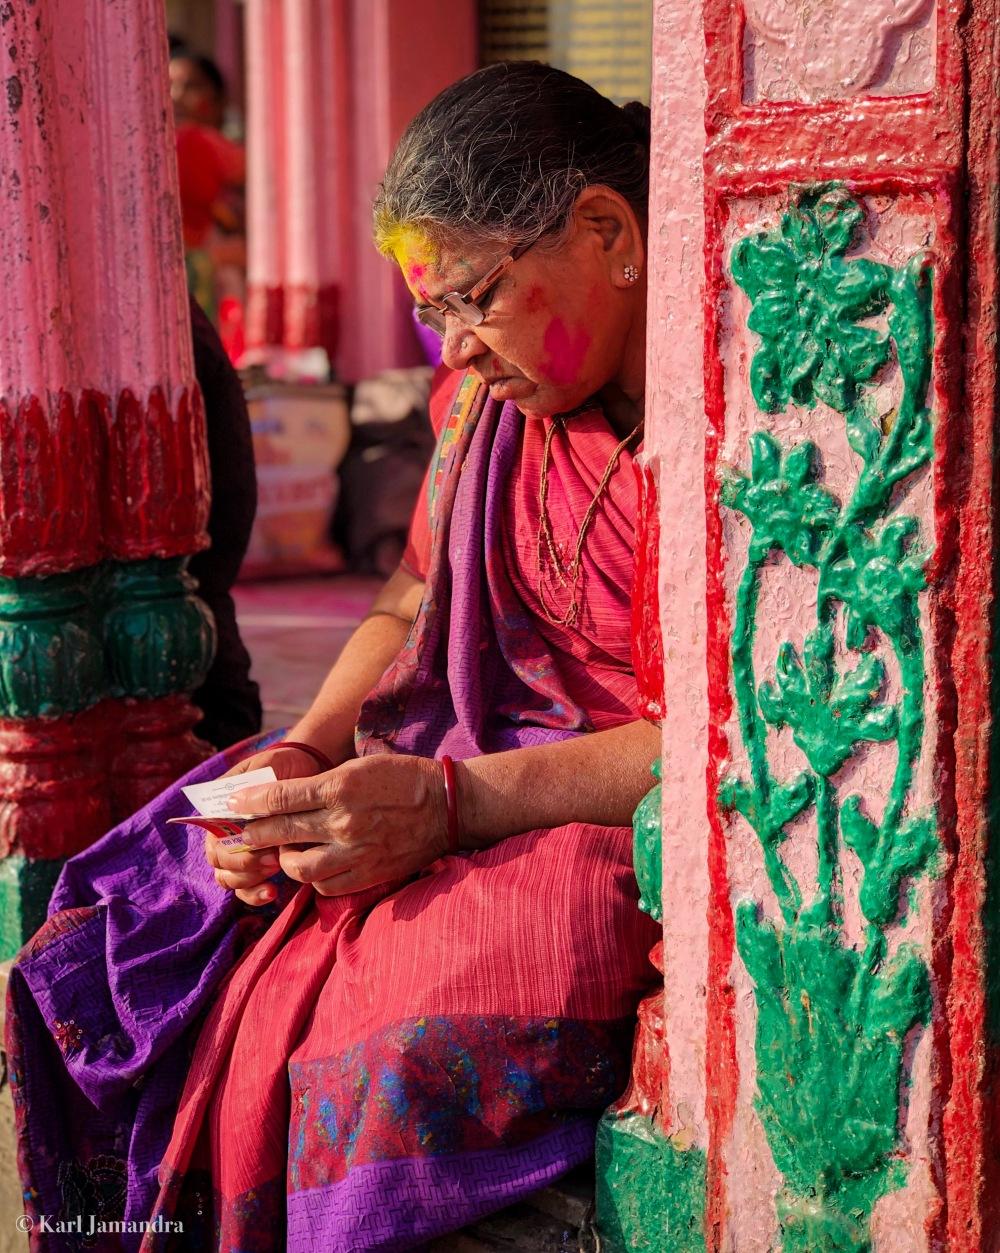 A HINDU WOMAN PRAYING.